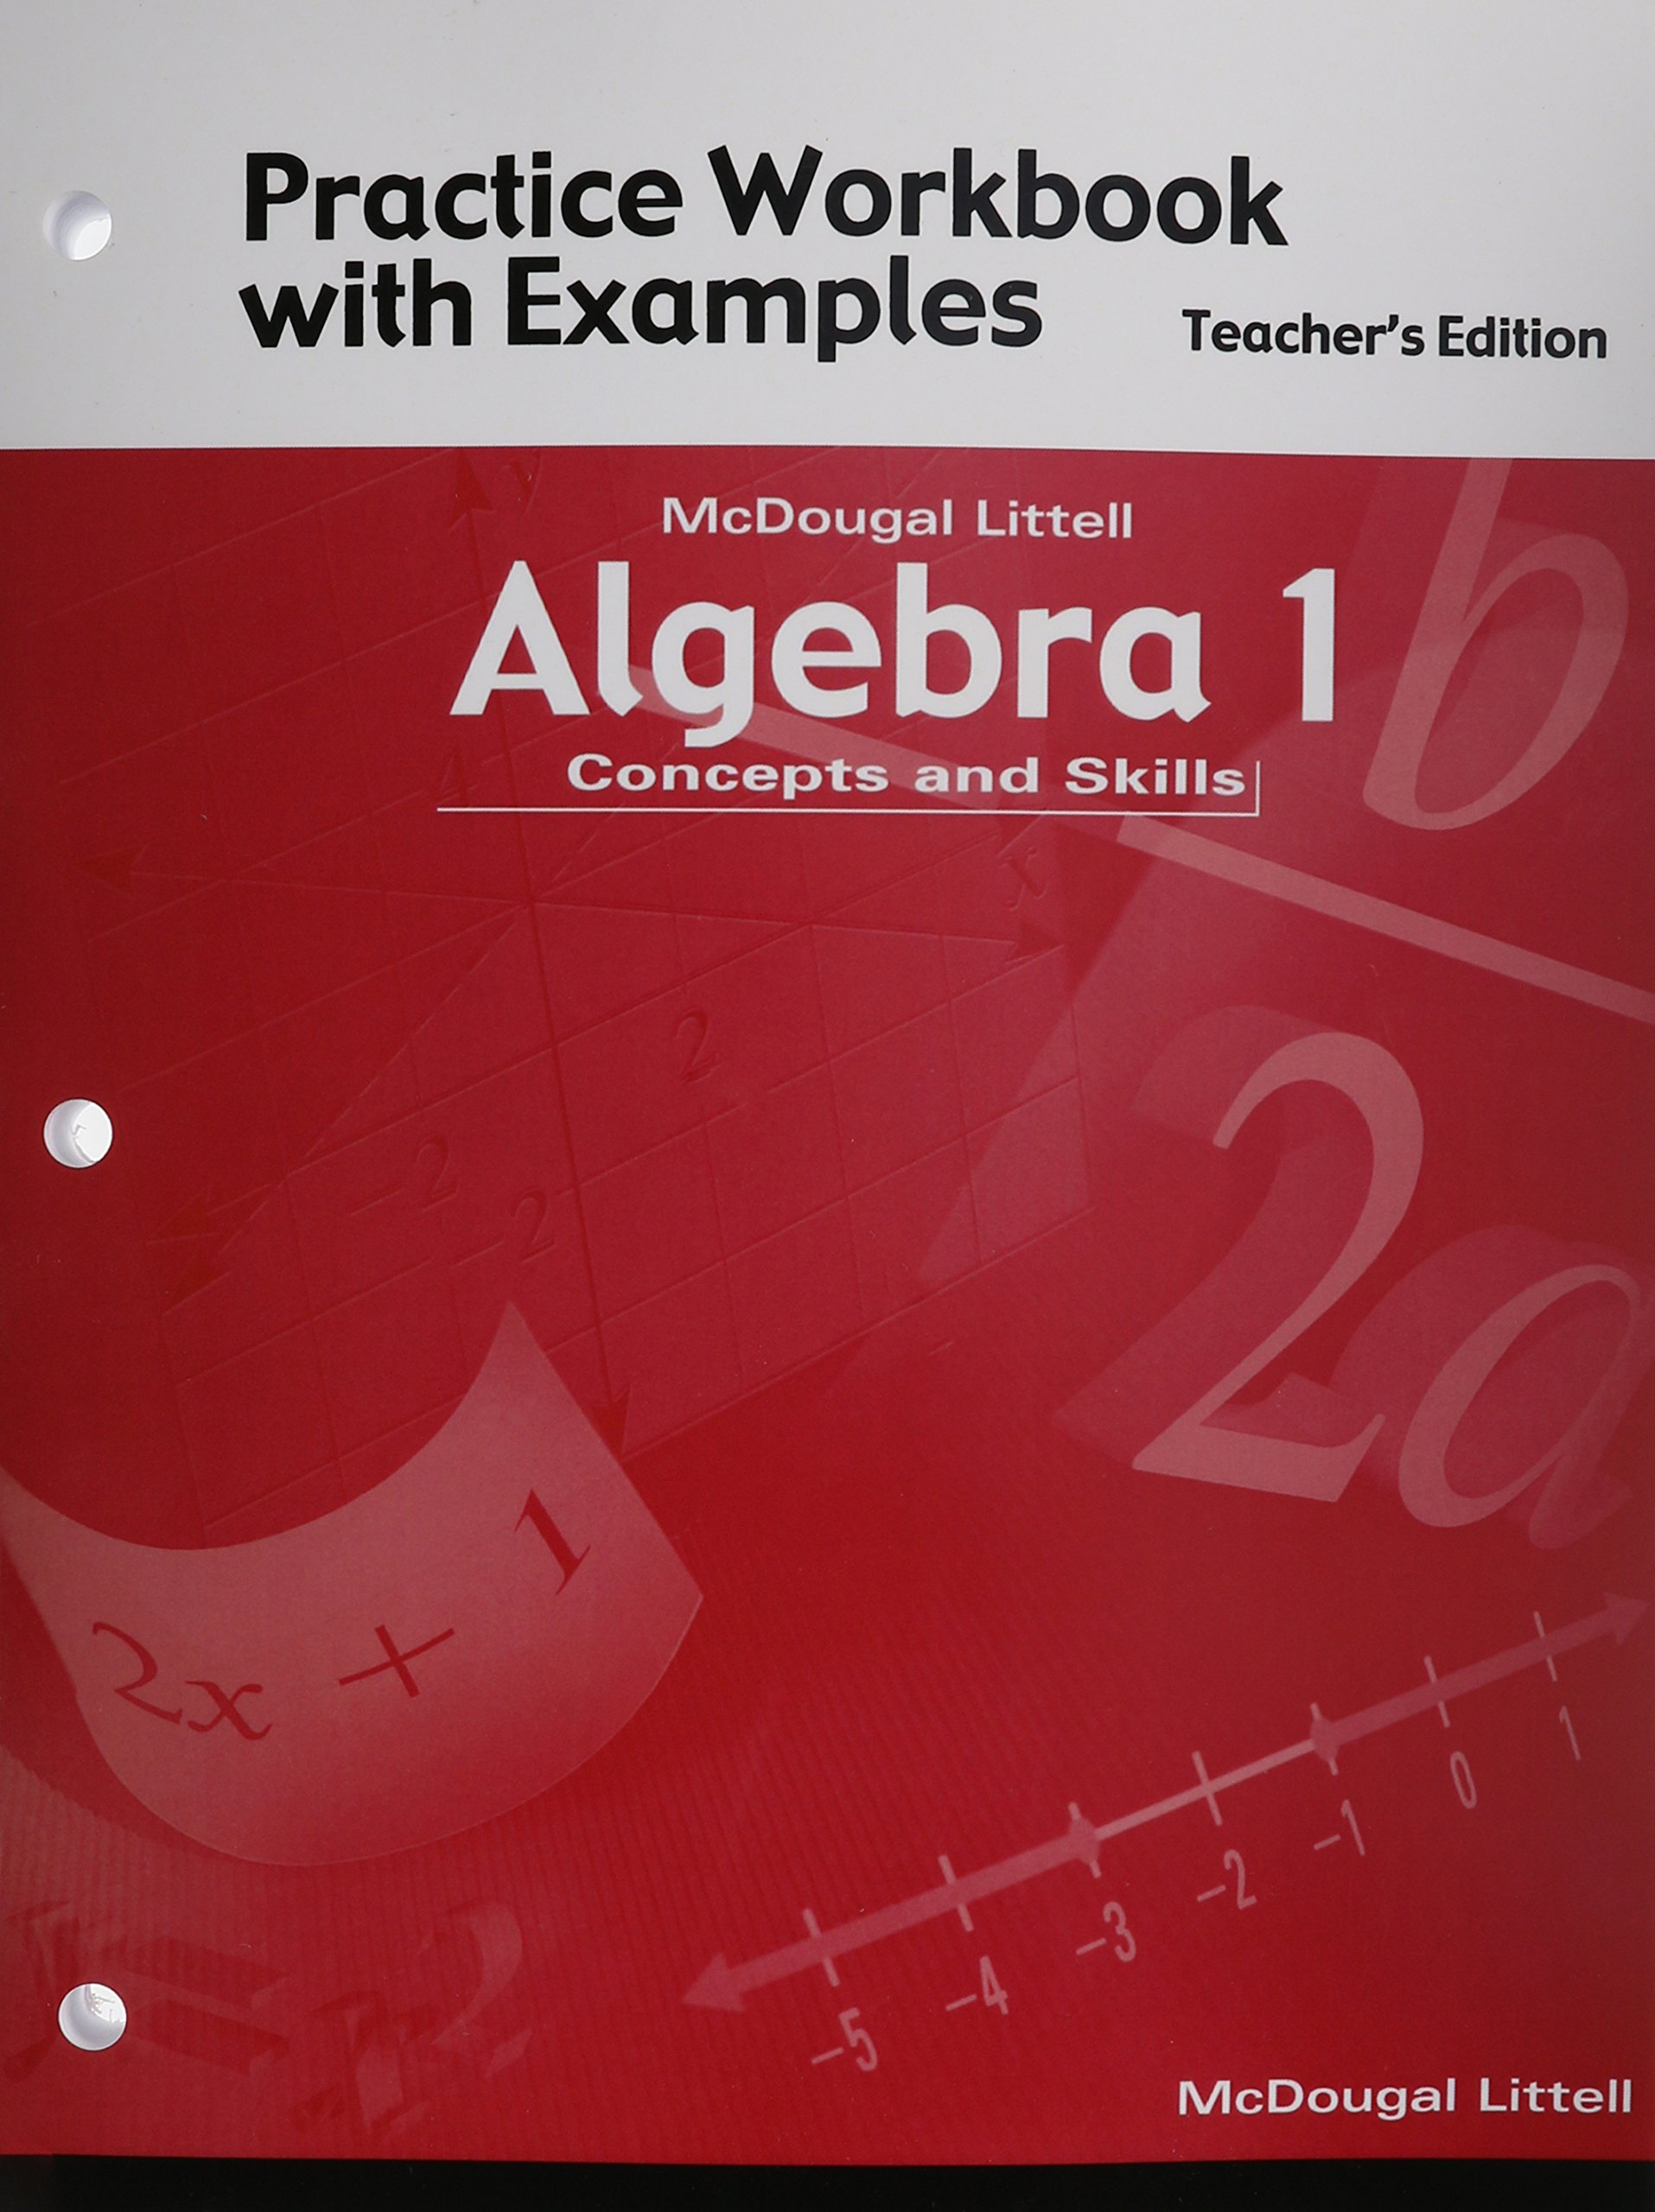 Worksheets Mcdougal Littell Algebra 1 Worksheet Answers algebra 1 concepts and skills practice workbook with examples teacher edition amazon co uk mcdougal littel 9780618078707 book